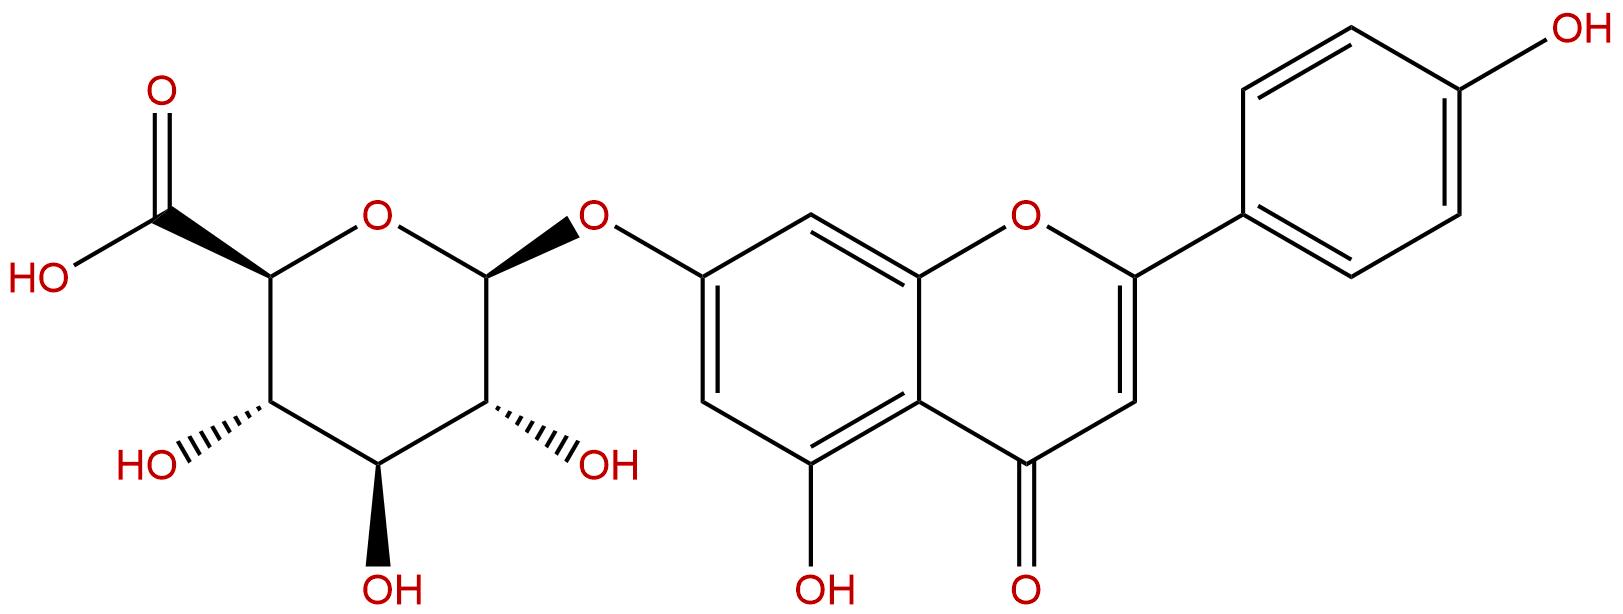 Apigenin-7-O-glucuronide